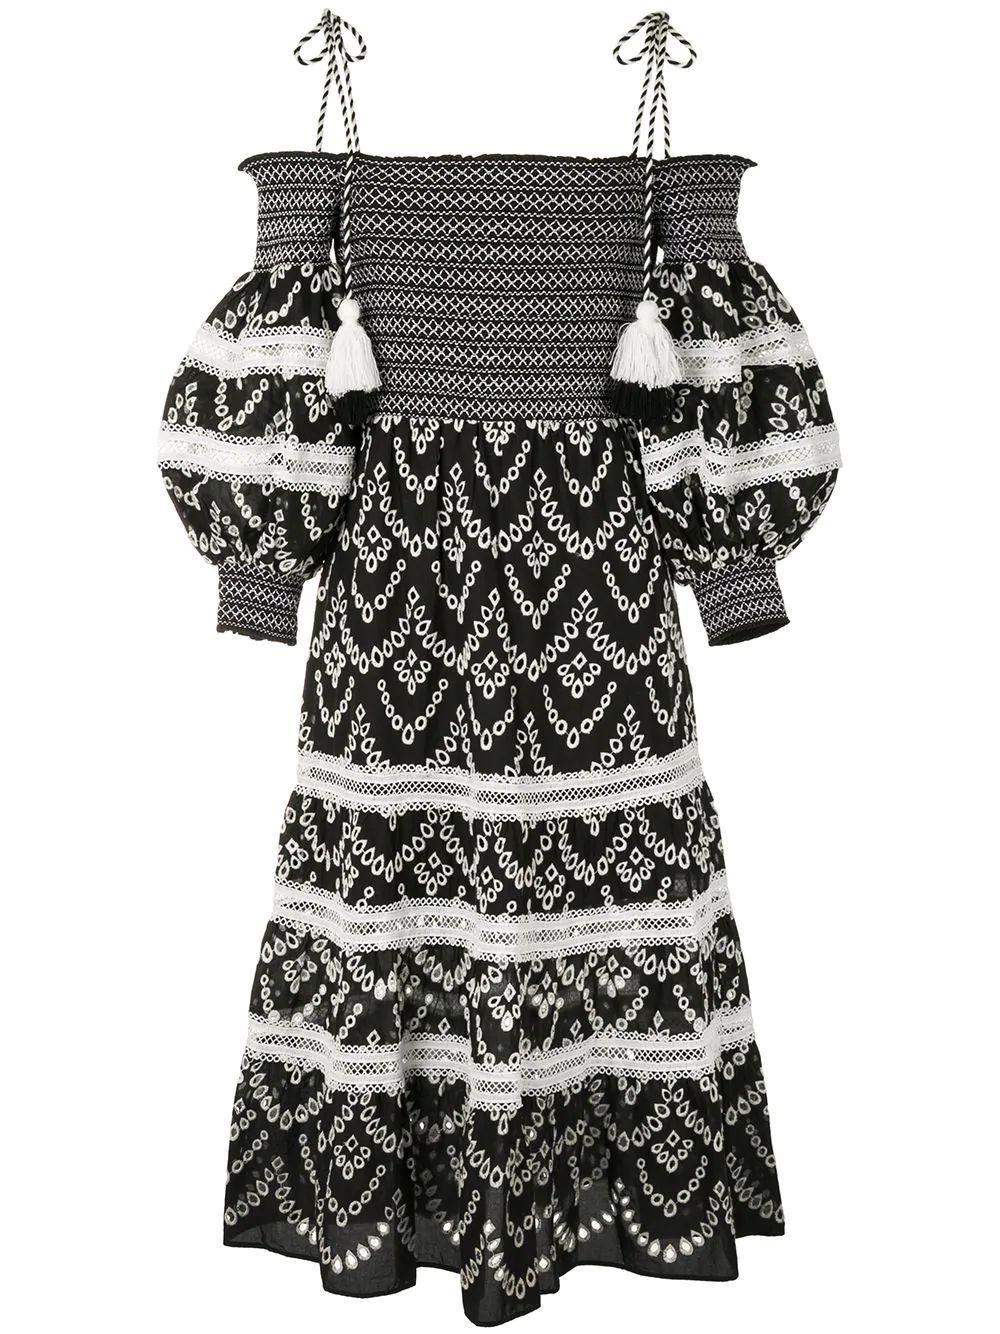 Catia Smocked Midi Dress Item # CC005D60525